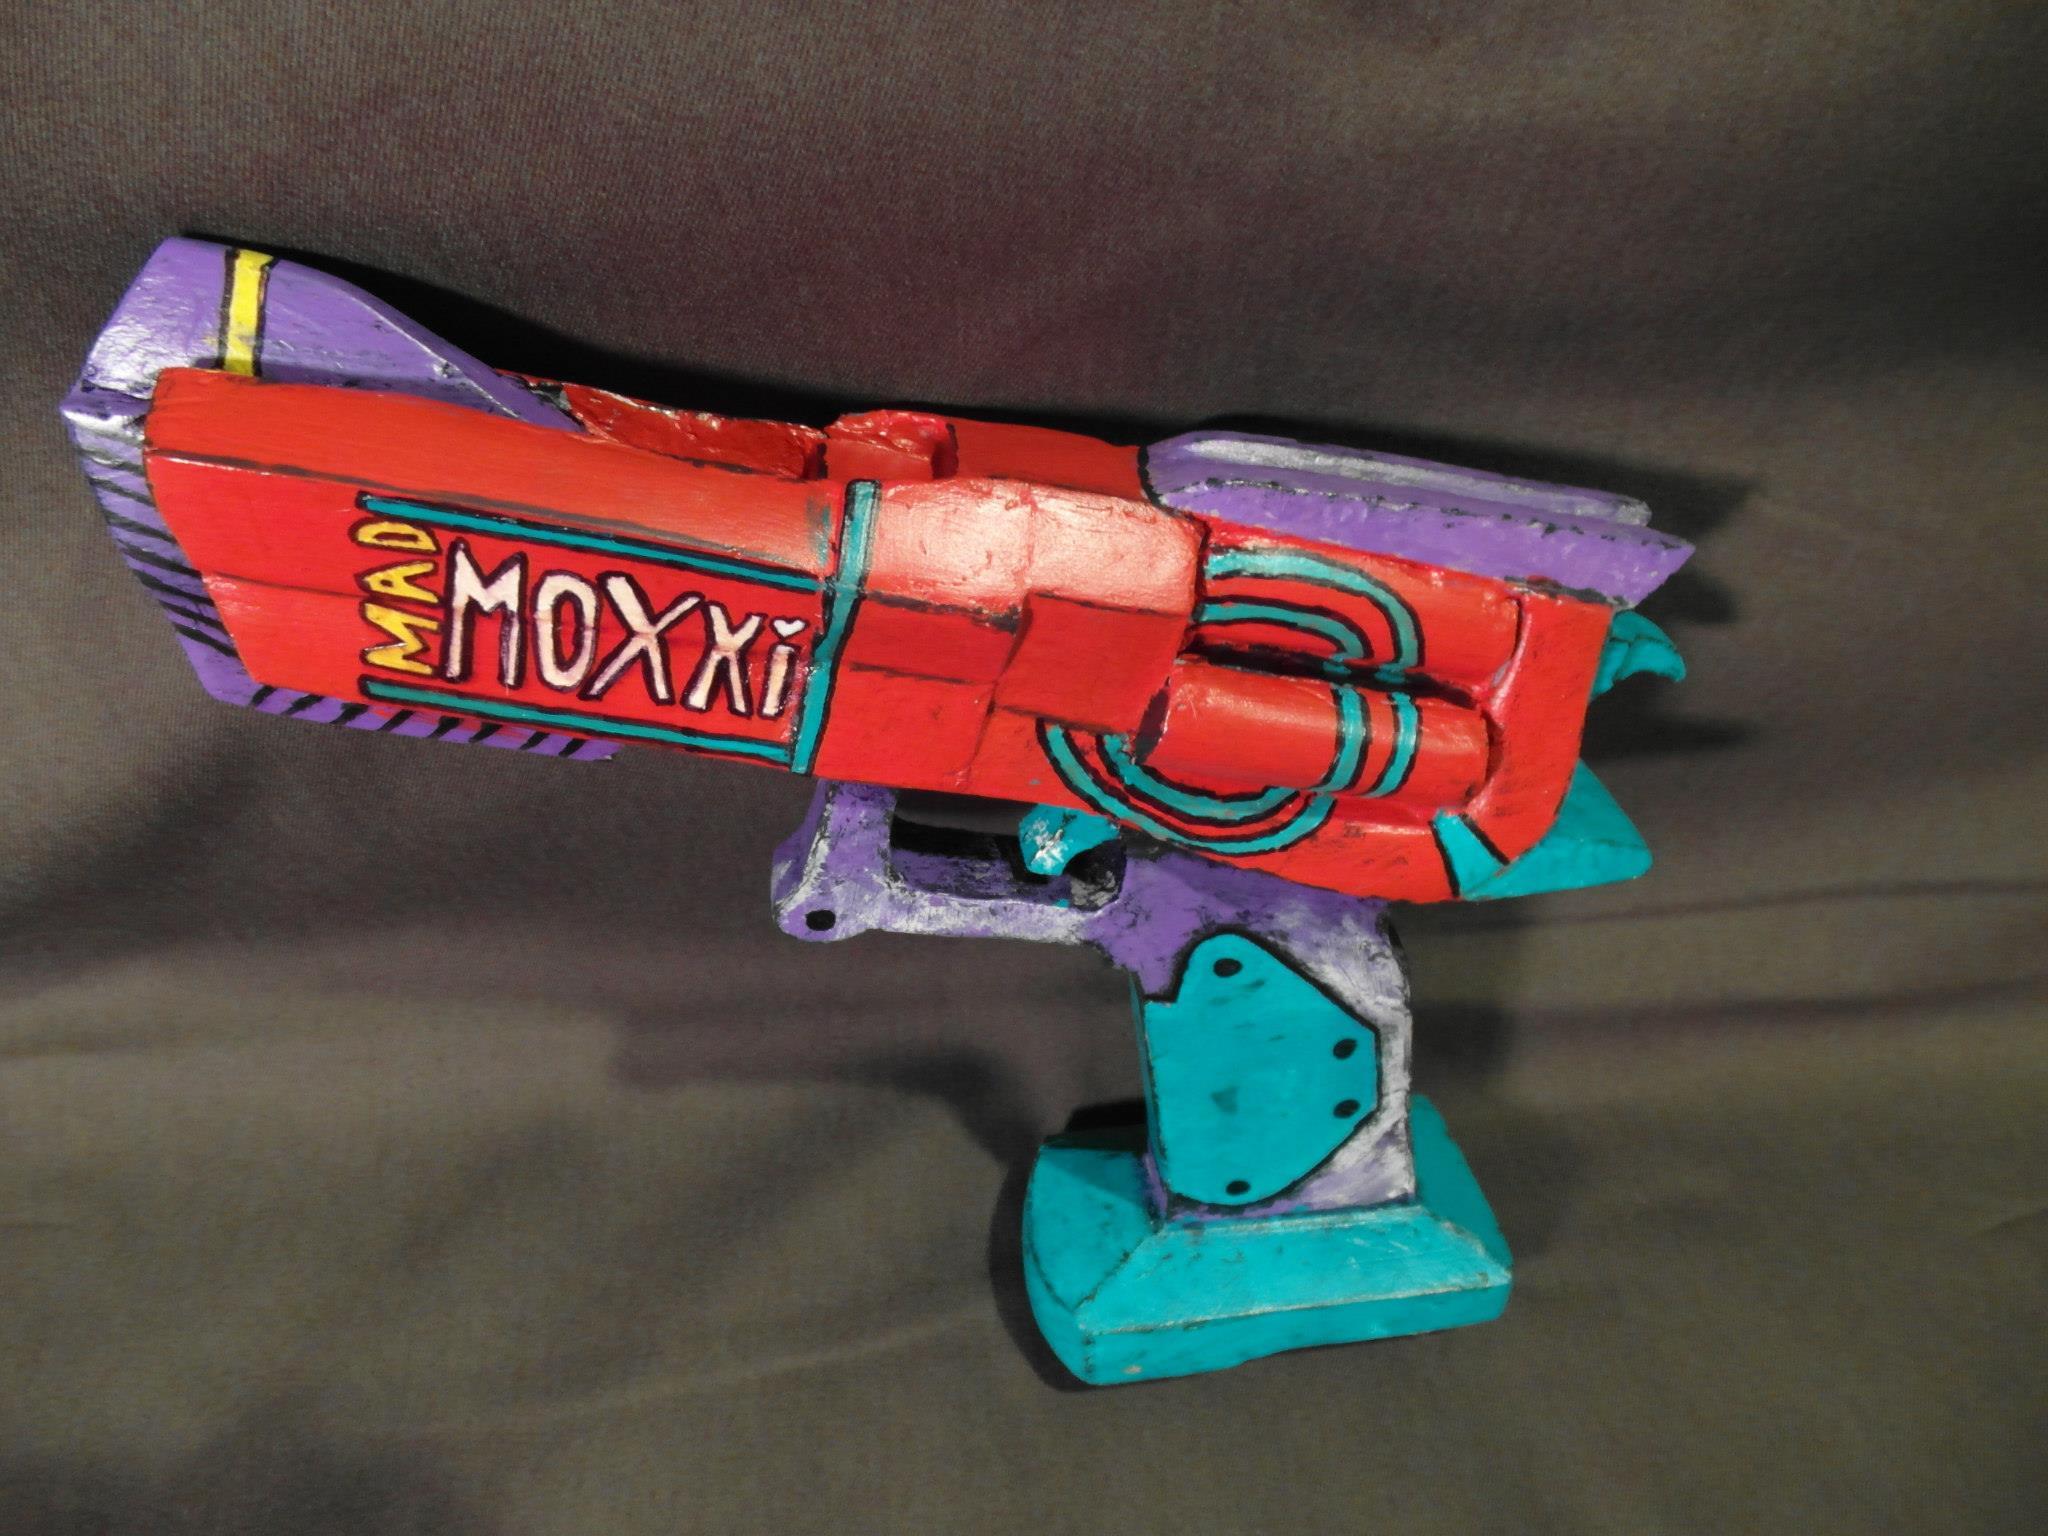 Cosplay Confidential Quartermaster's Cache - bioshock gun